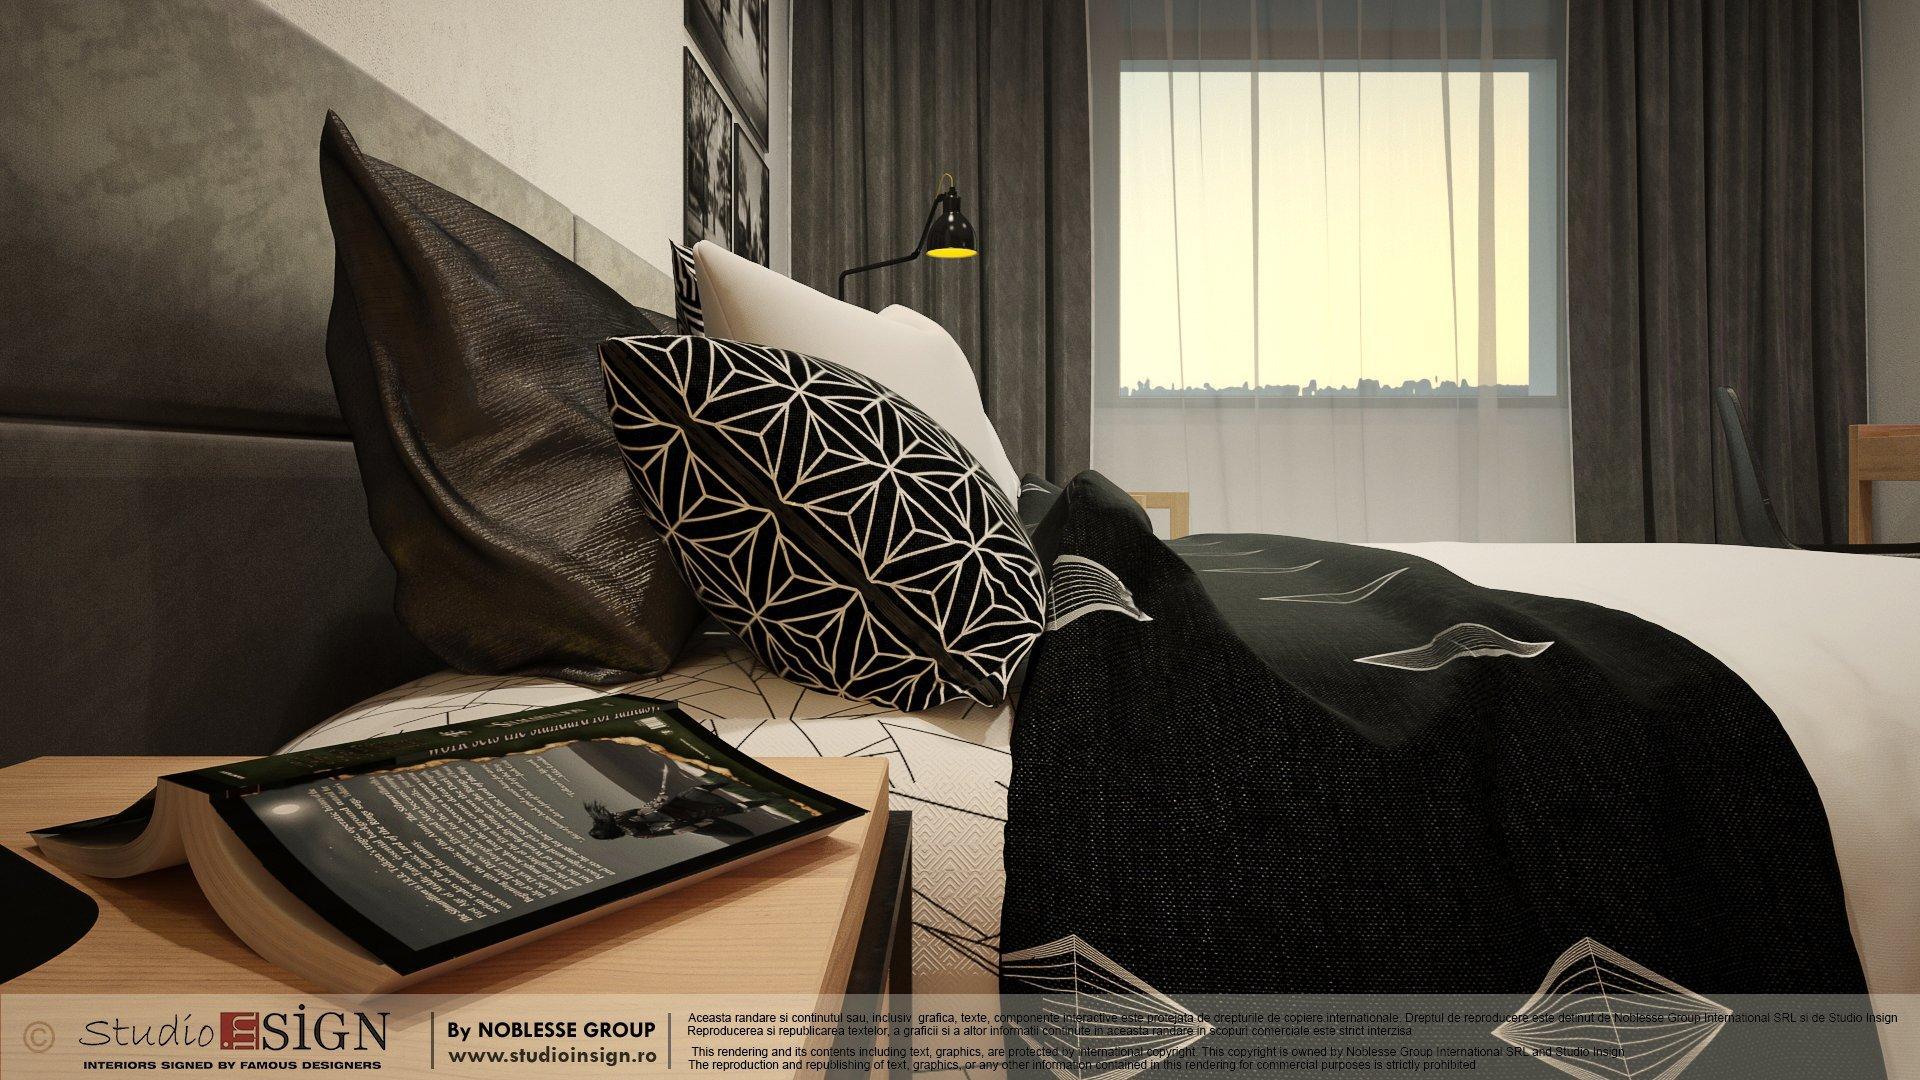 Proiect amenajare camera hotel in stil loft industrial newyorkez-seara-5